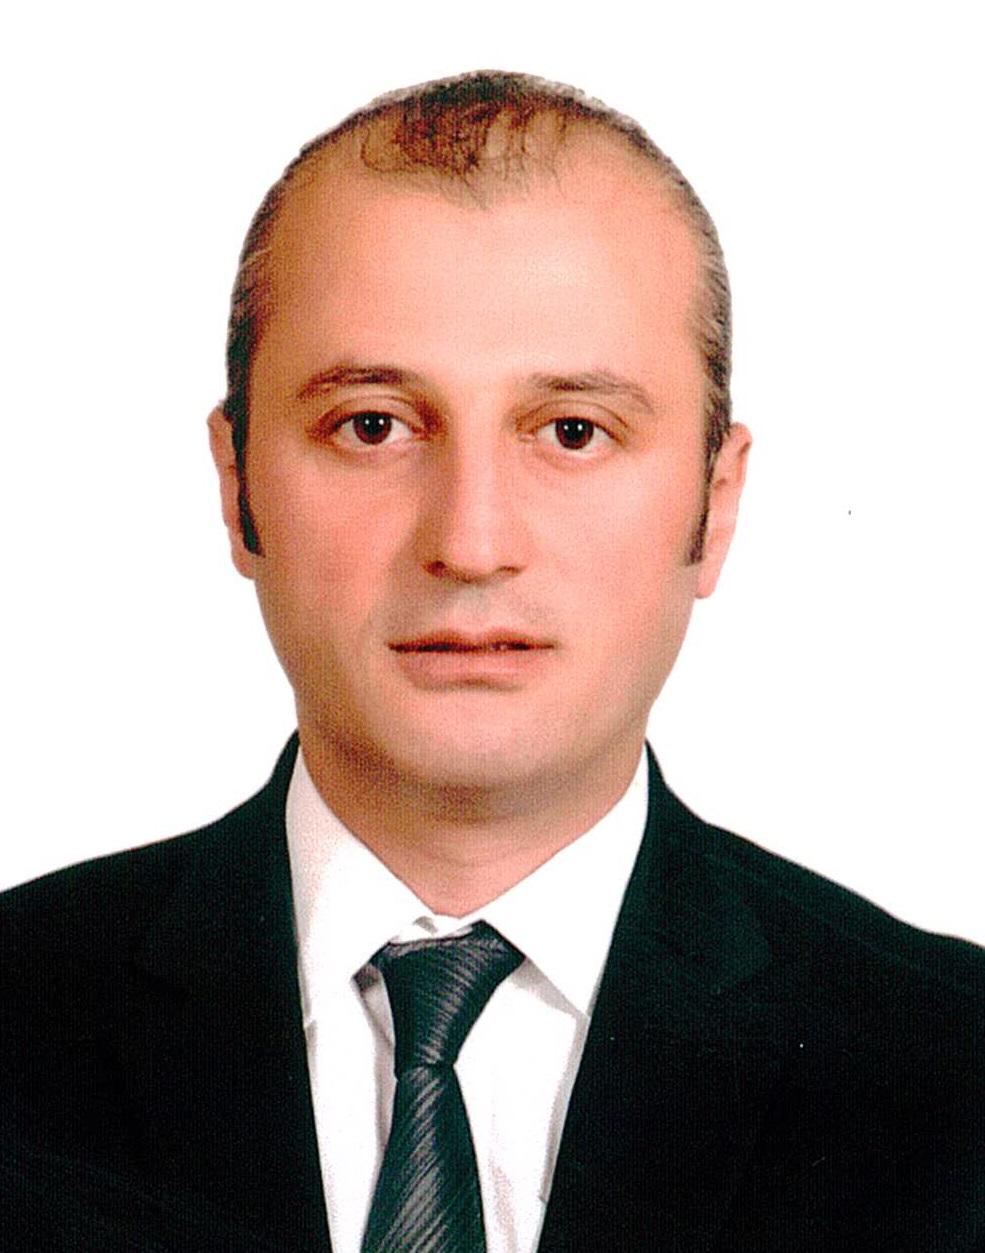 Prof. Dr. RAİF KANDEMİR